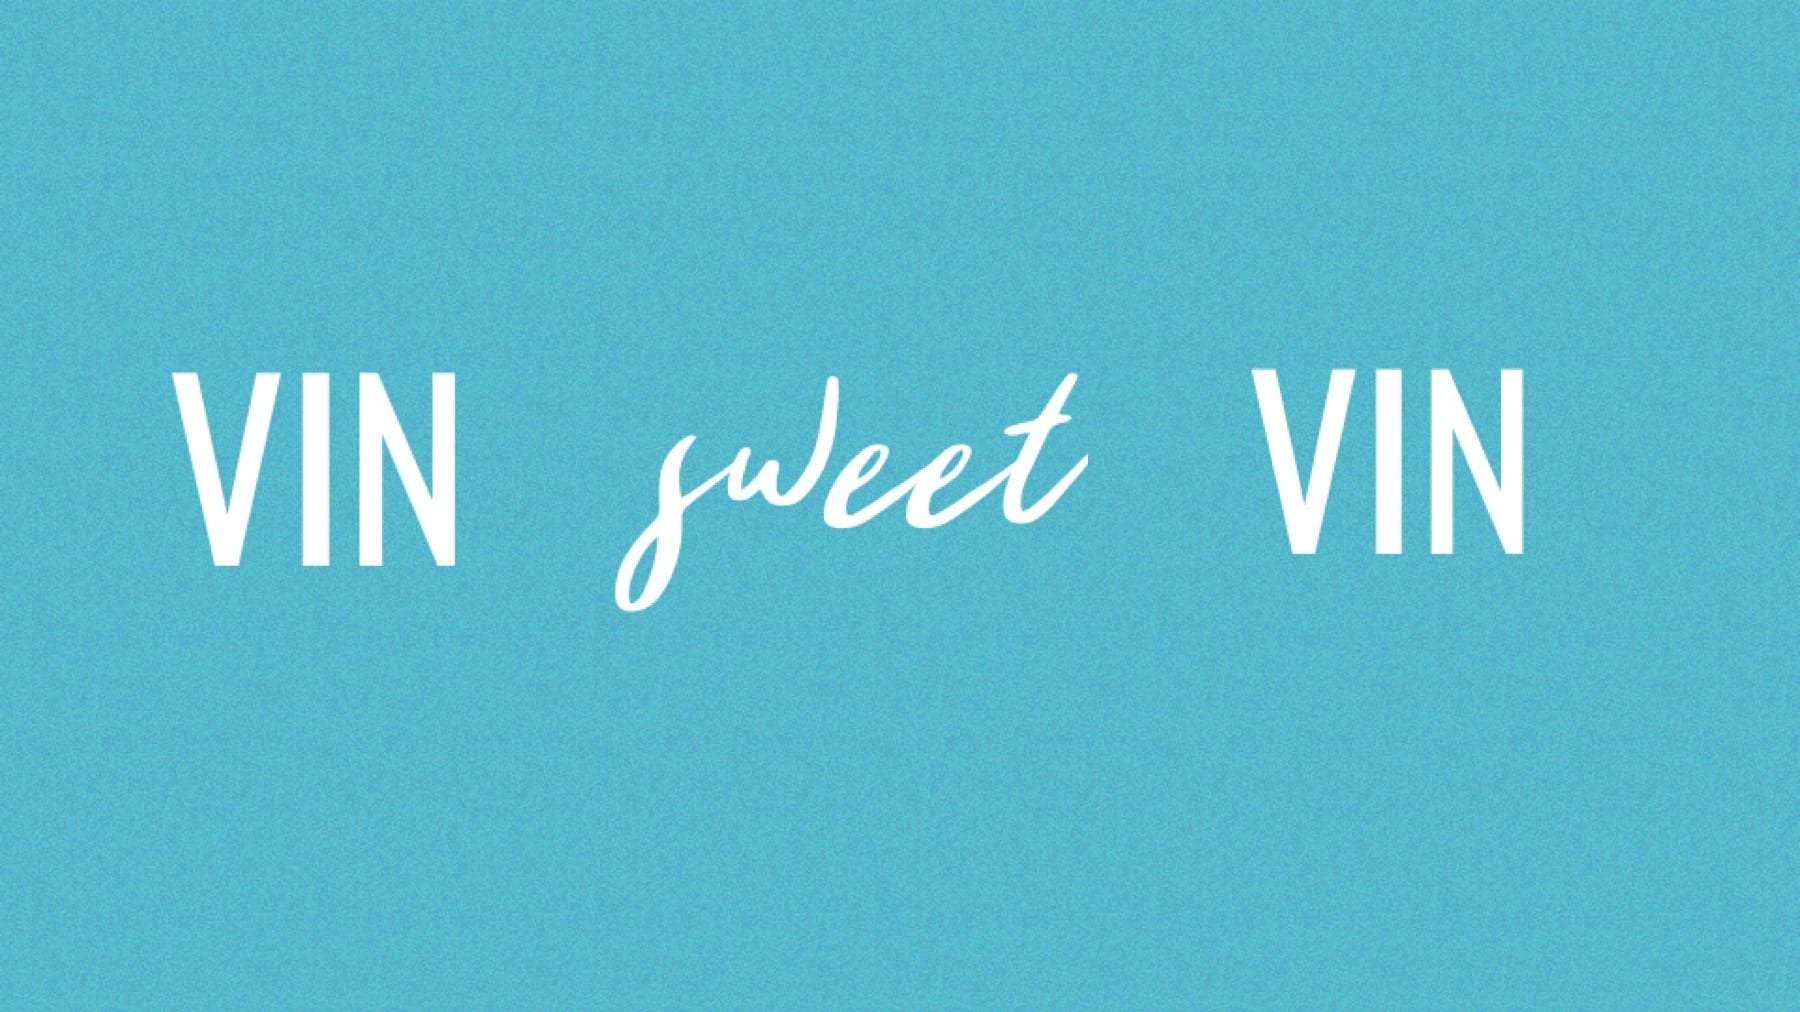 vin sweet vin